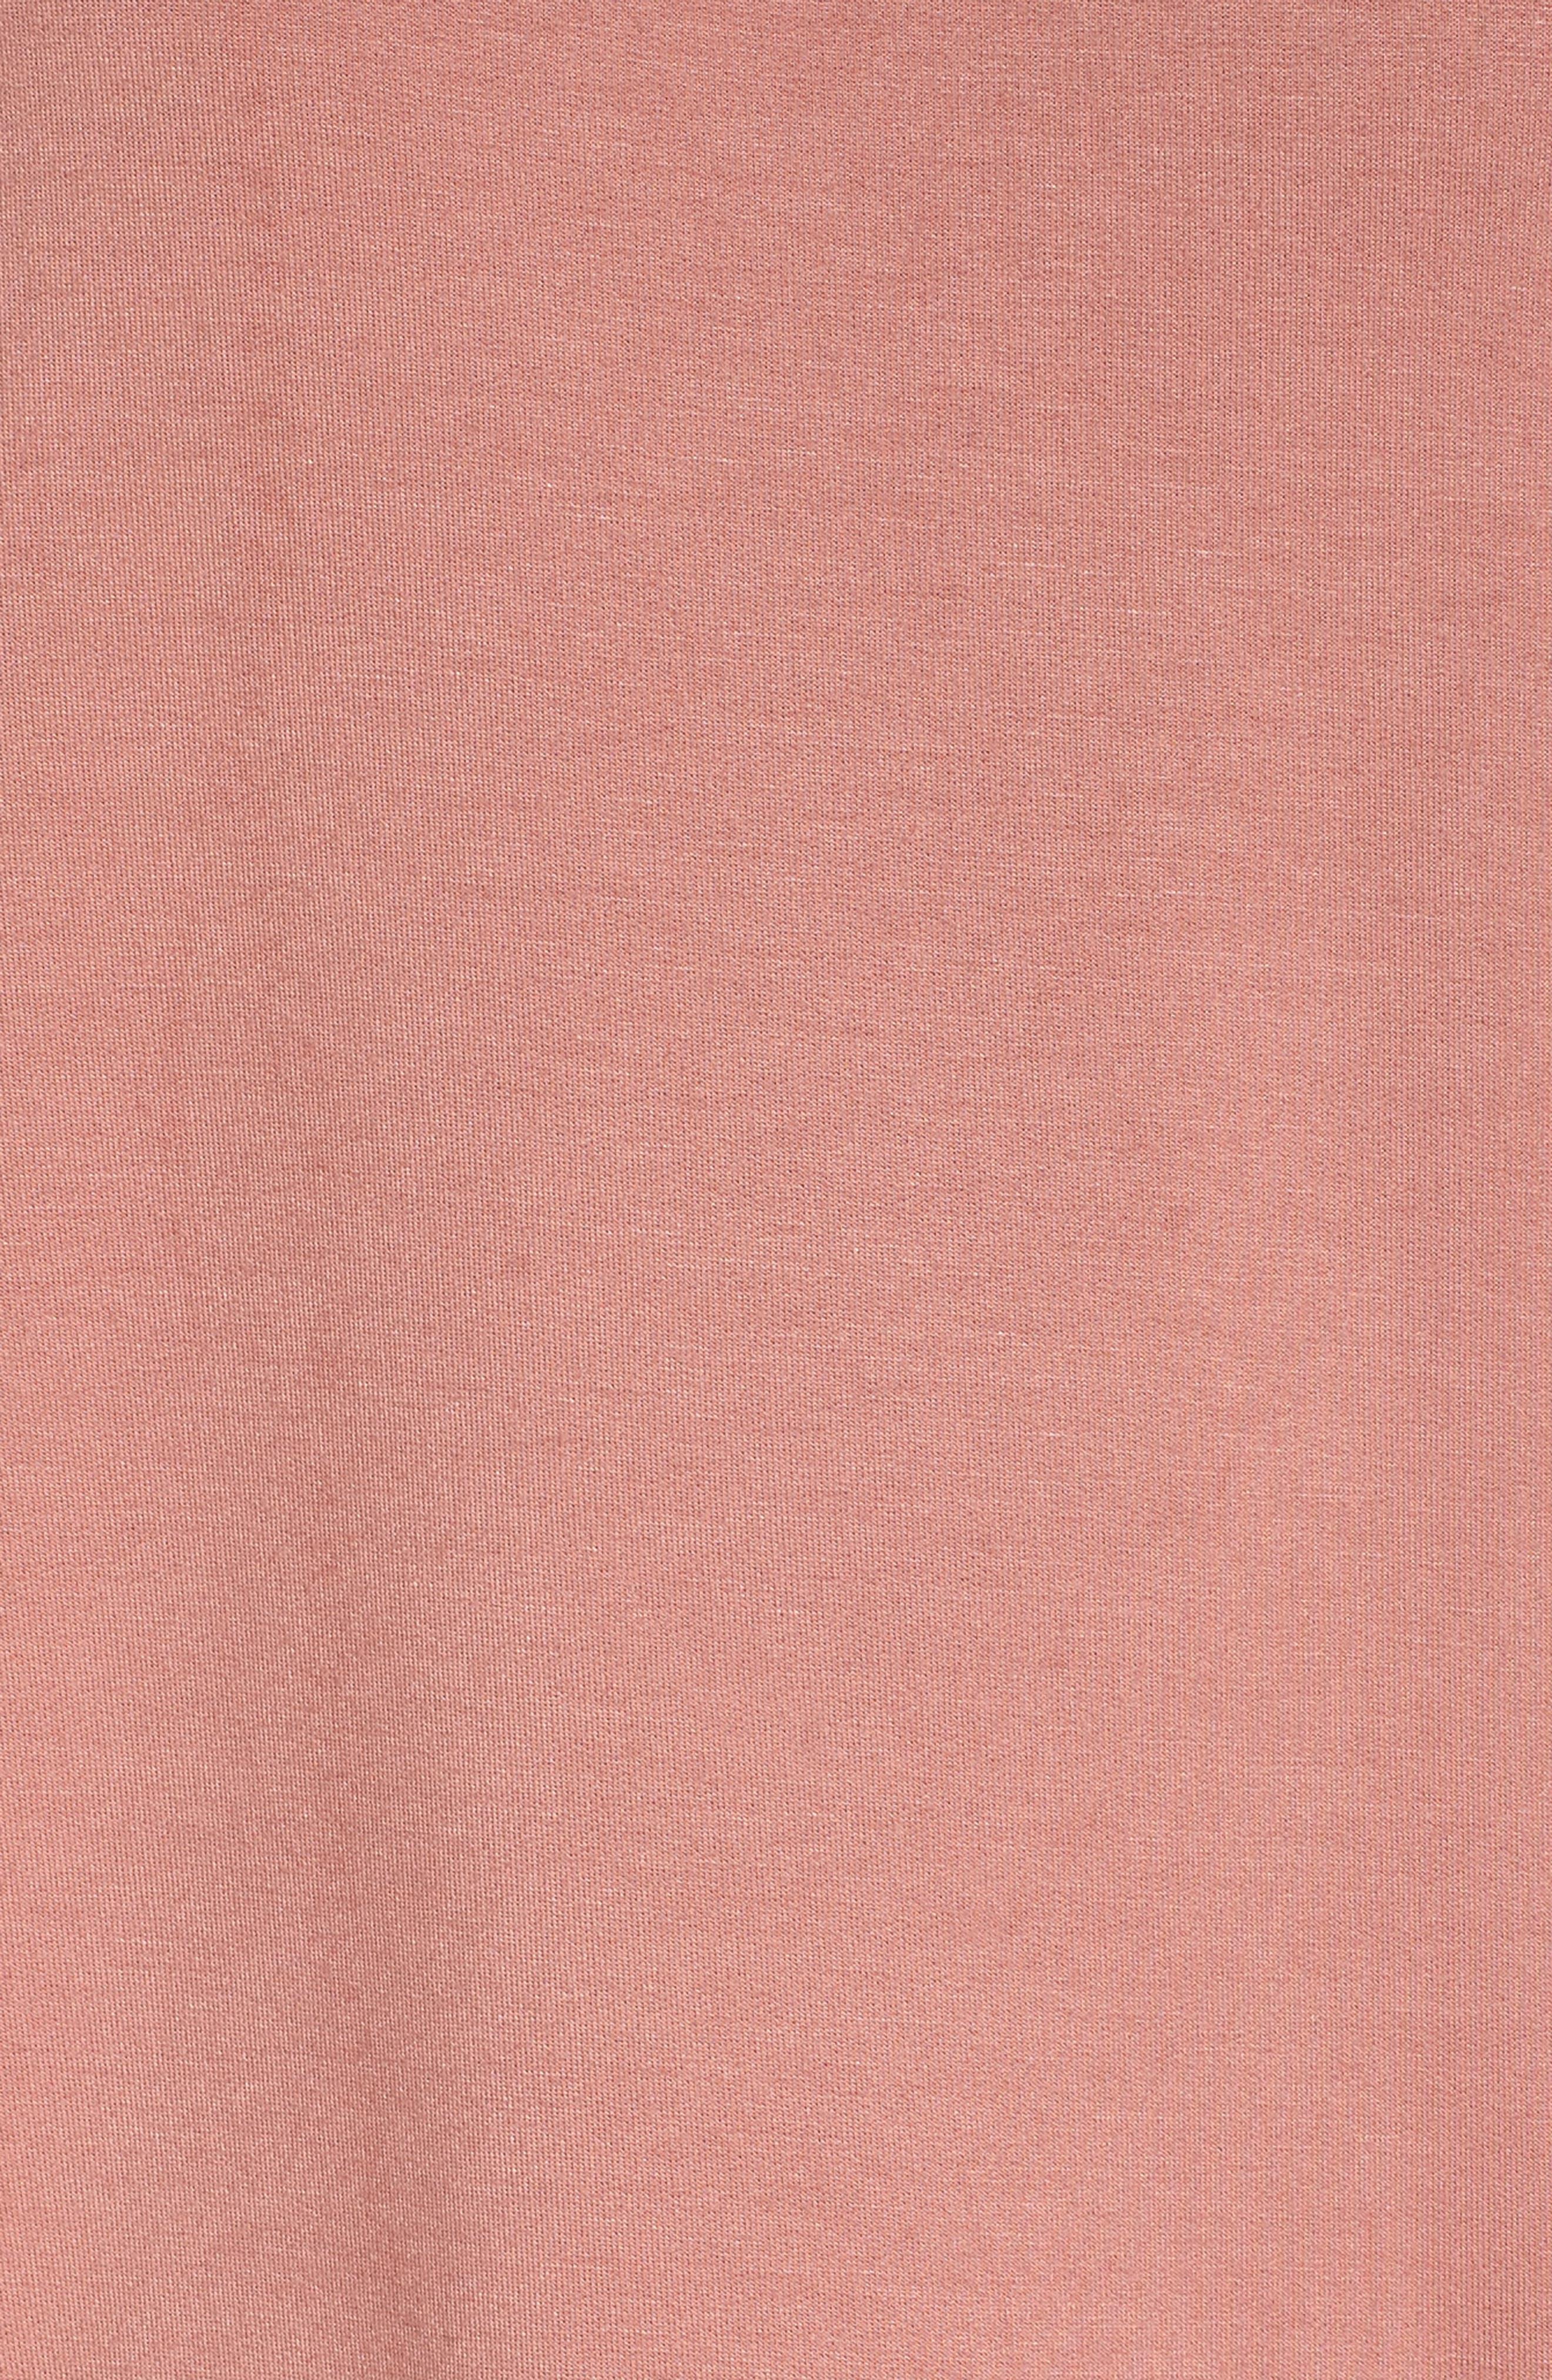 Elevens Sweatshirt,                             Alternate thumbnail 5, color,                             MAUVE/ SAND